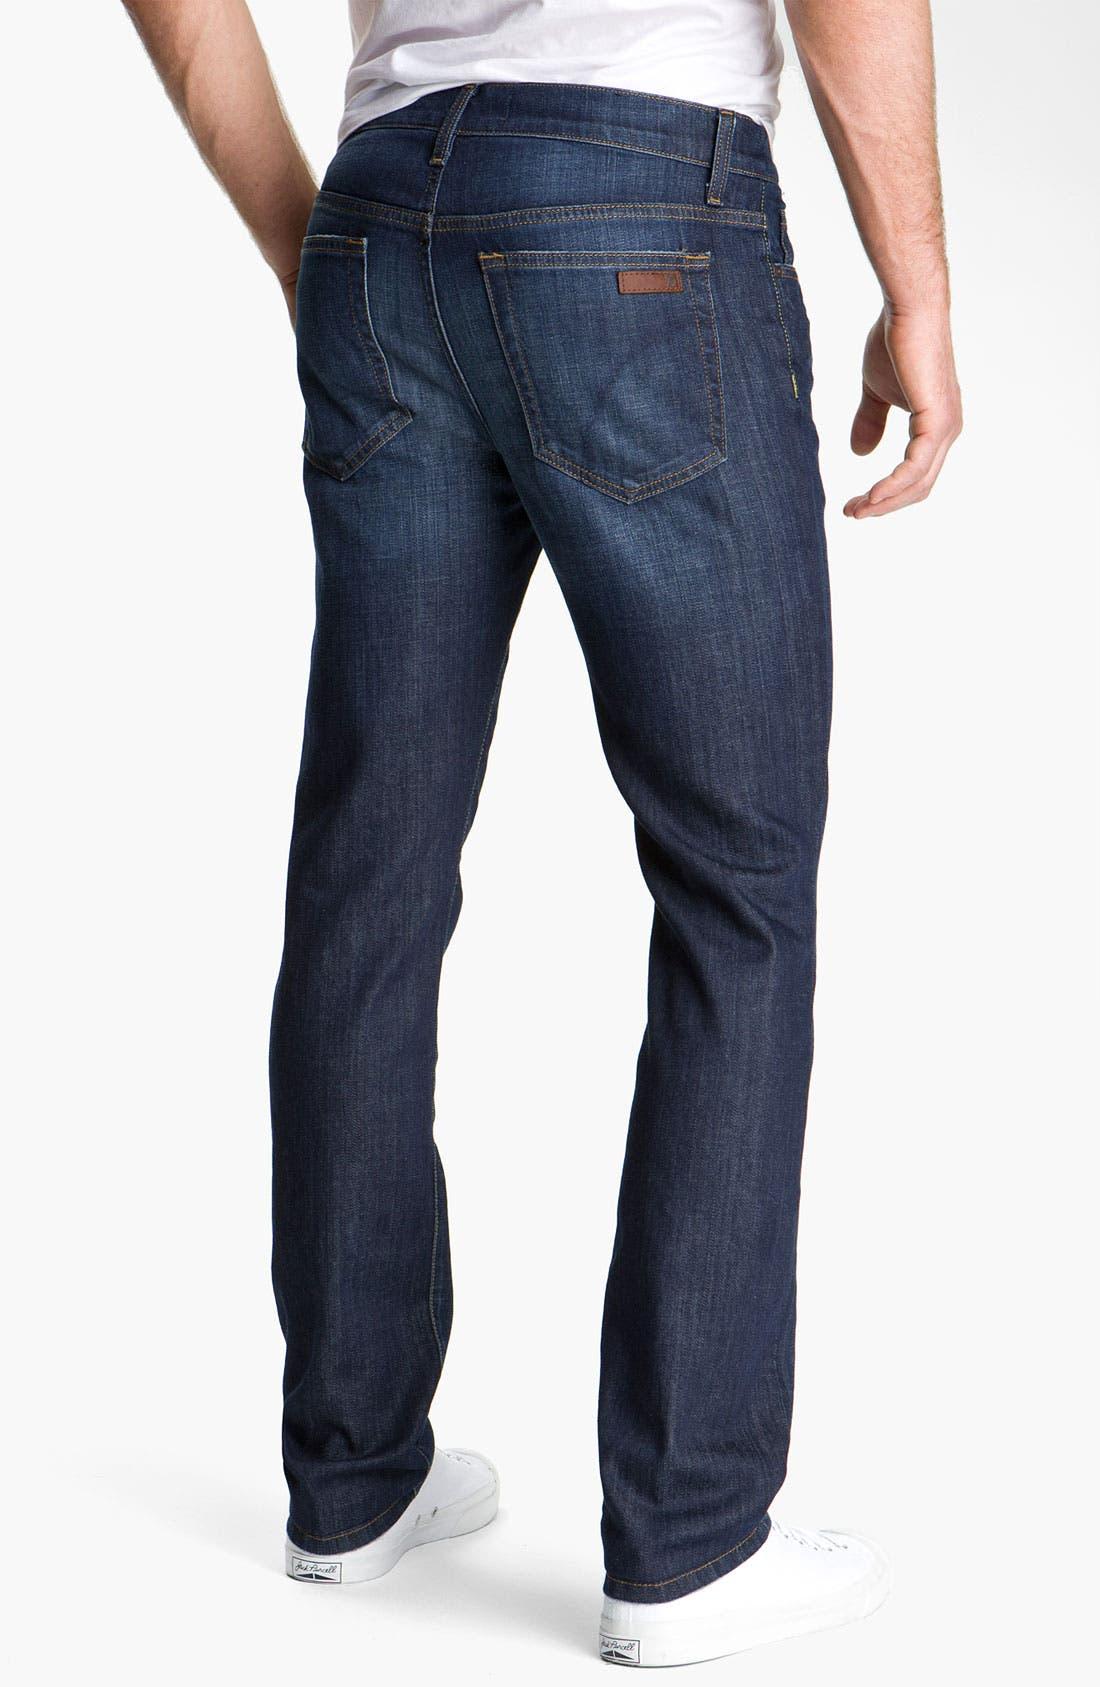 Alternate Image 1 Selected - Joe's 'Brixton' Slim Straight Leg Jeans (Kieran)